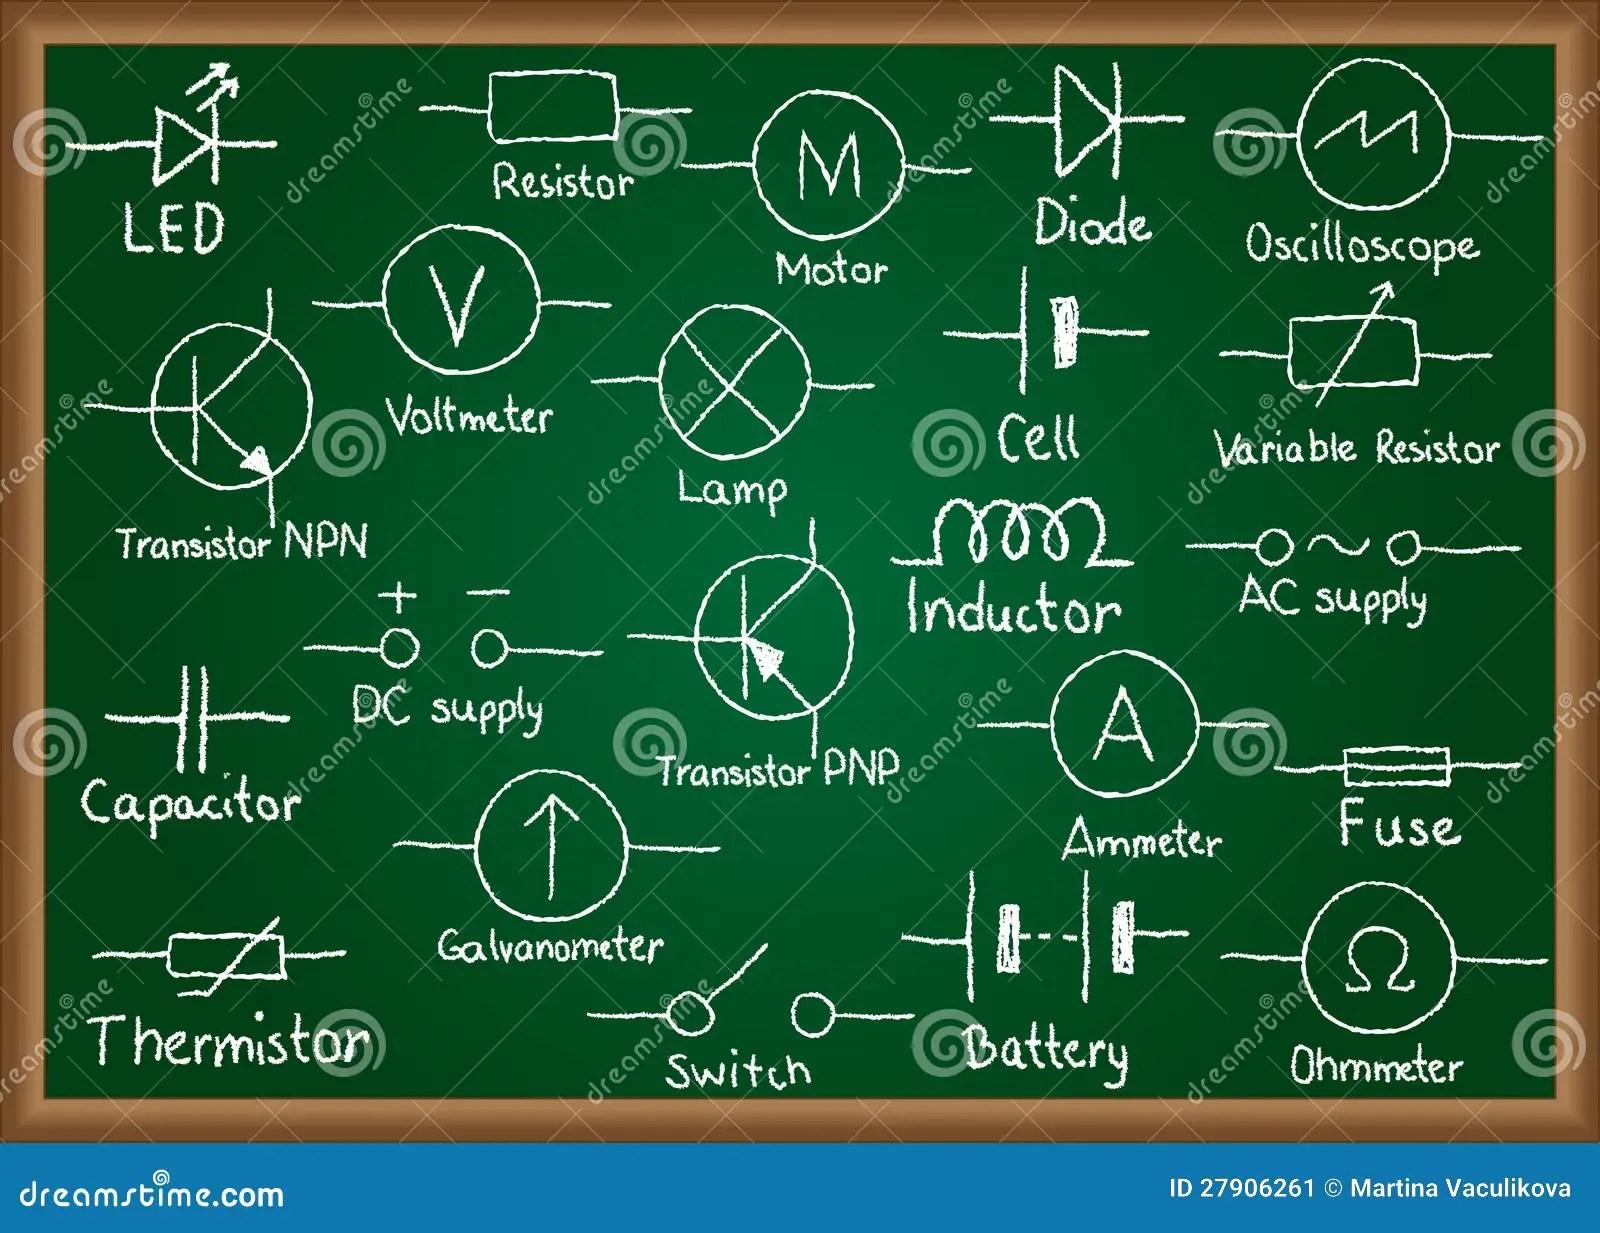 Symbols Standard Schematic Symbols Electrical Wiring Diagram Symbols